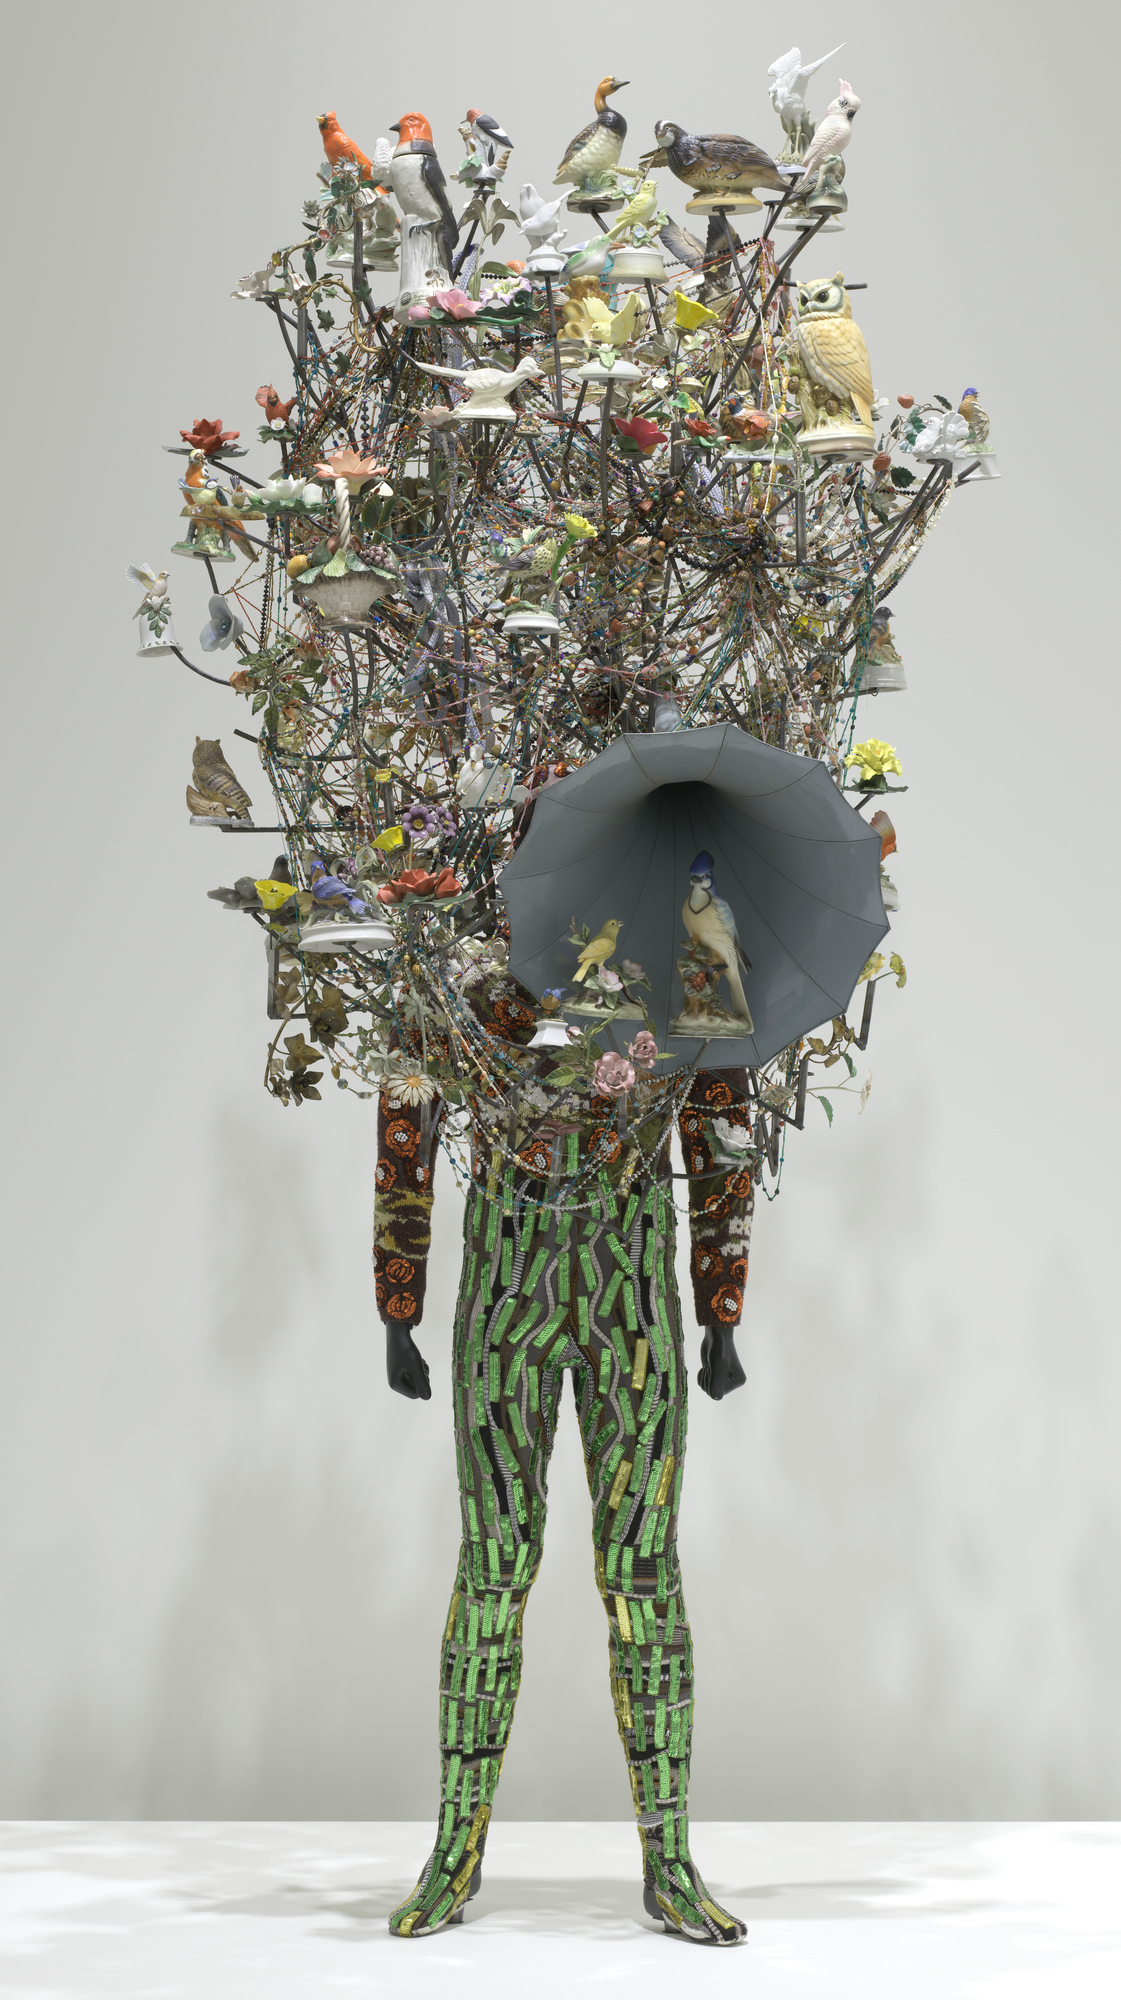 Nick Cave - Soundsuit (2011) (courtesy of MoMA)